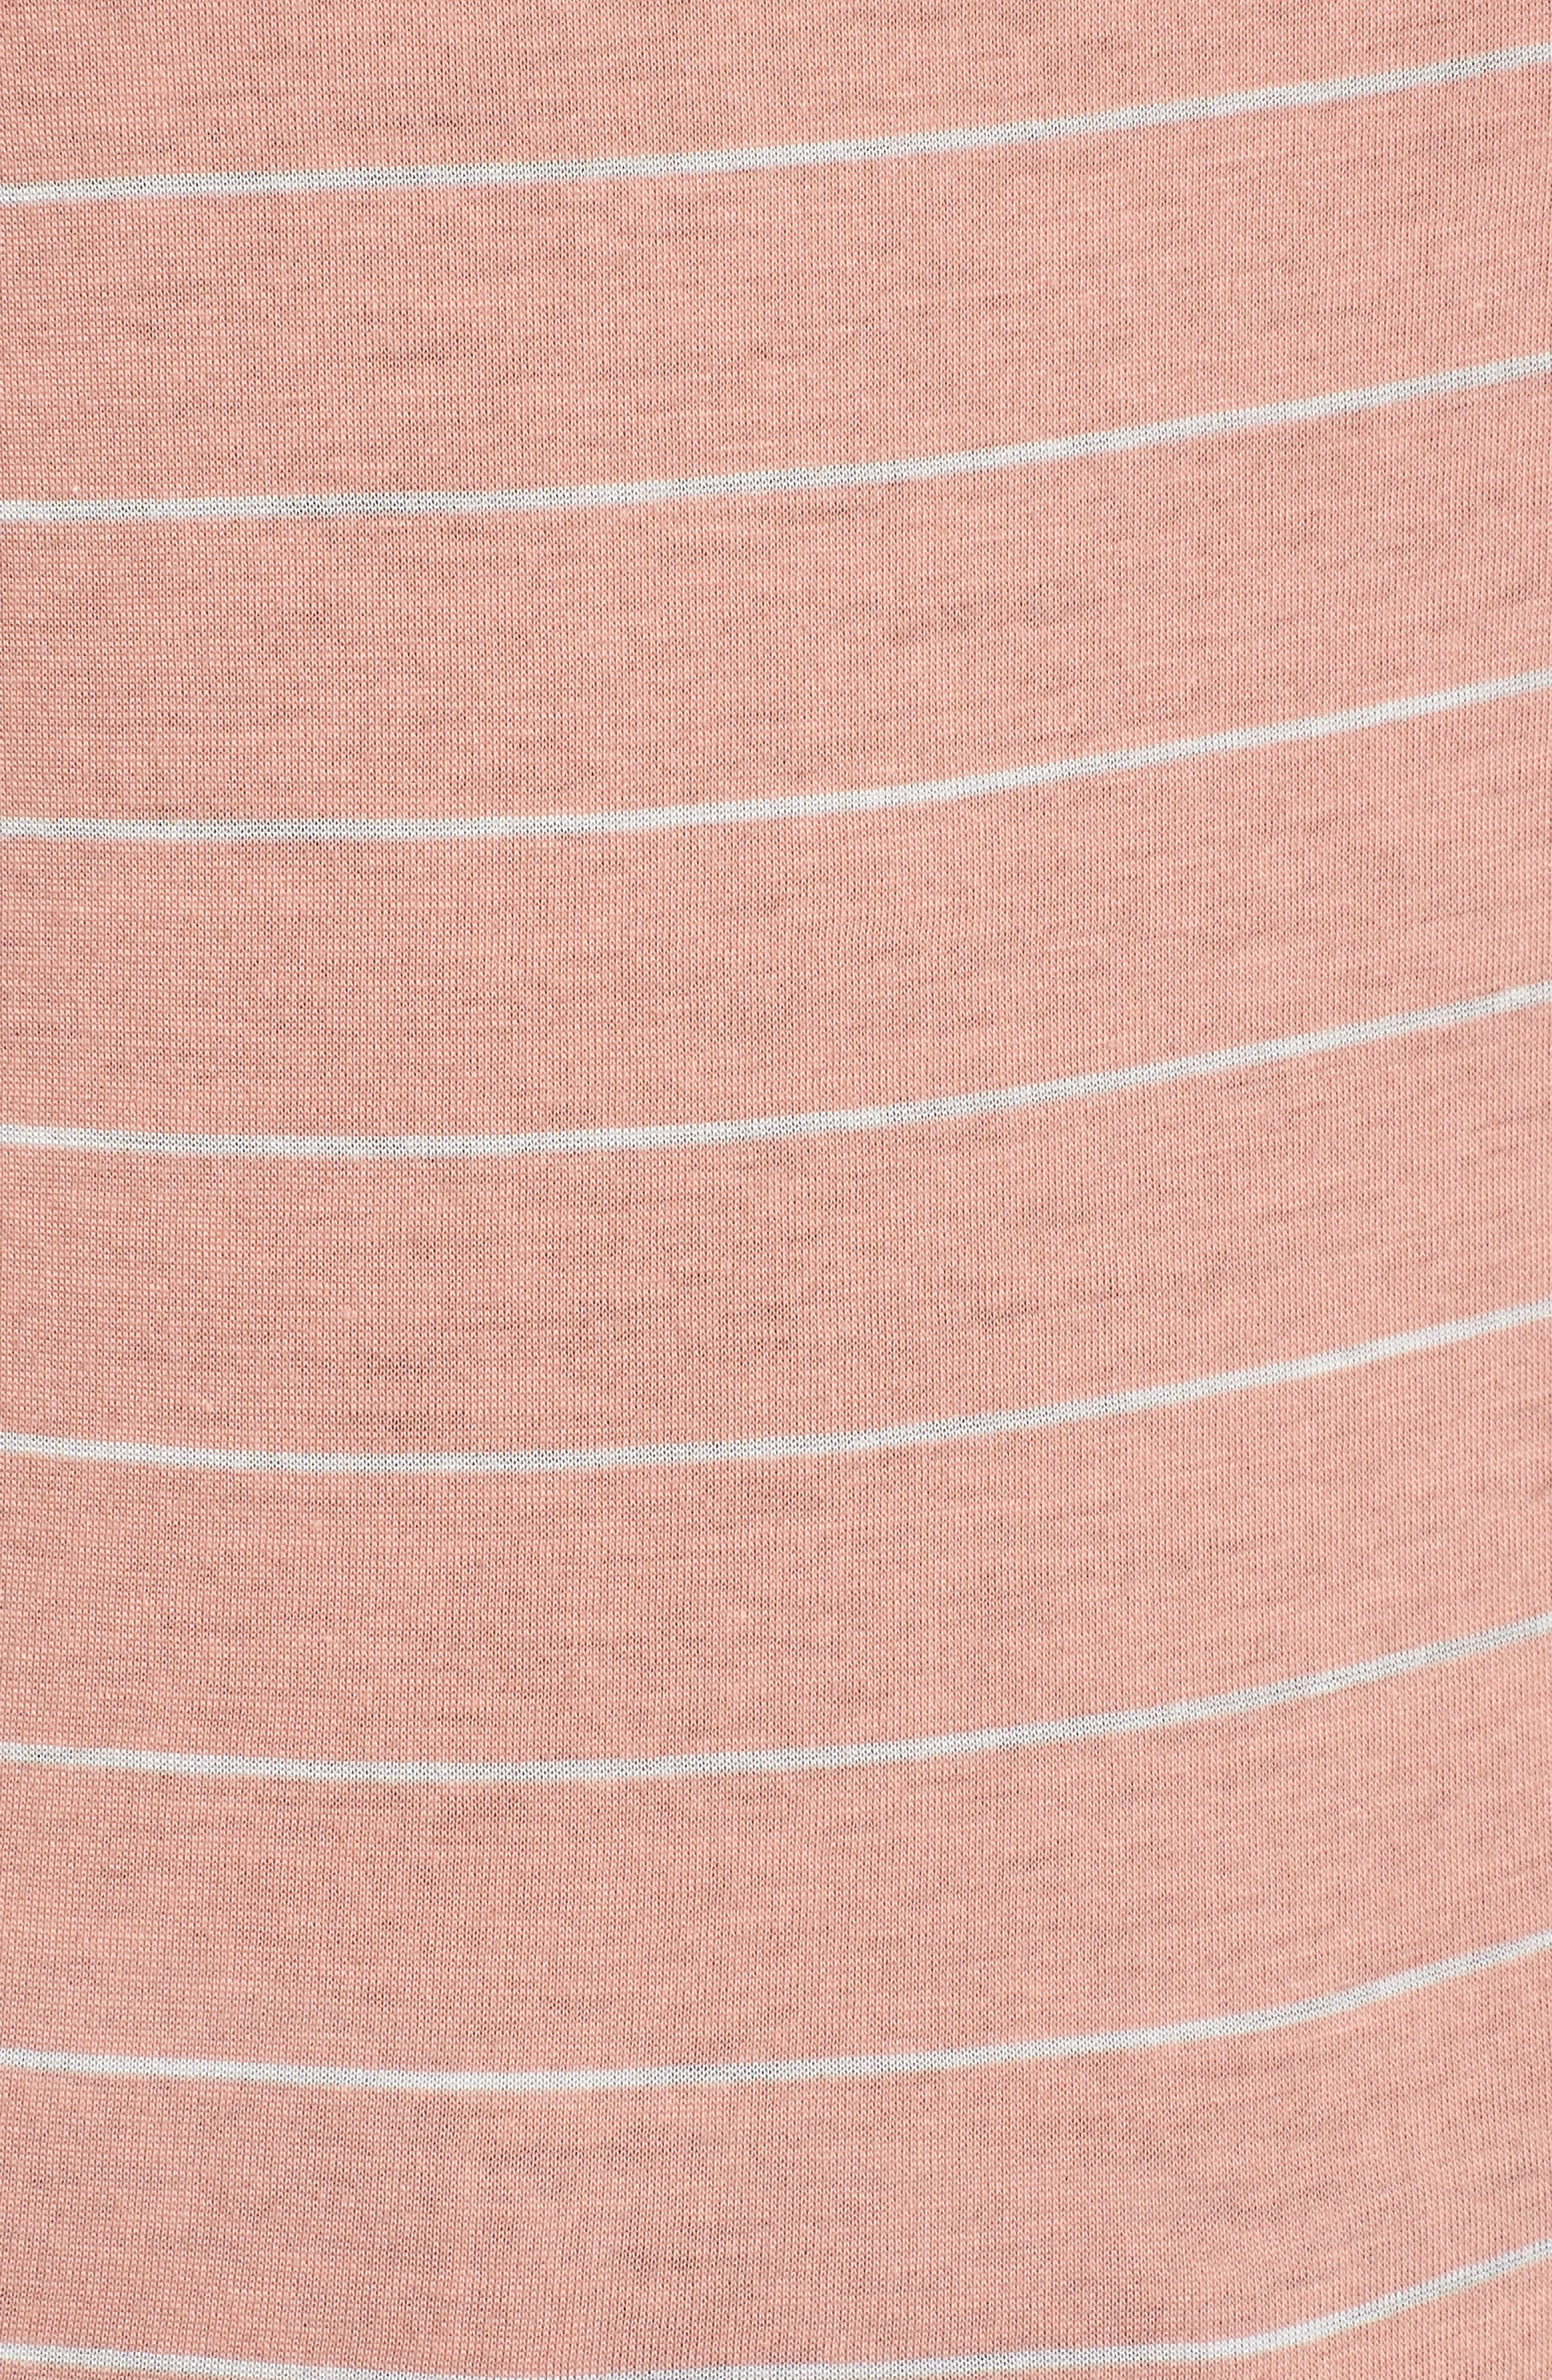 Ruffle Sleeve Tee,                             Alternate thumbnail 5, color,                             Rose-White